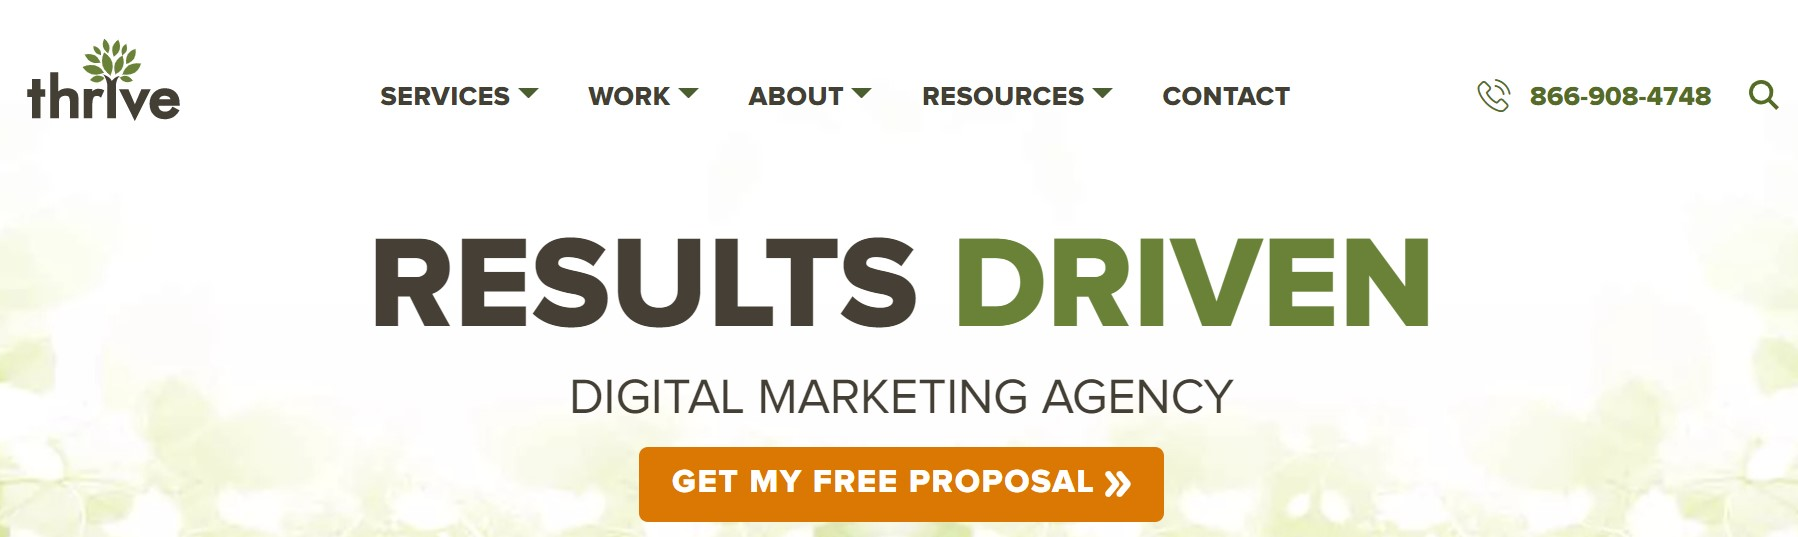 thrive-top-digital-marketing-agencies